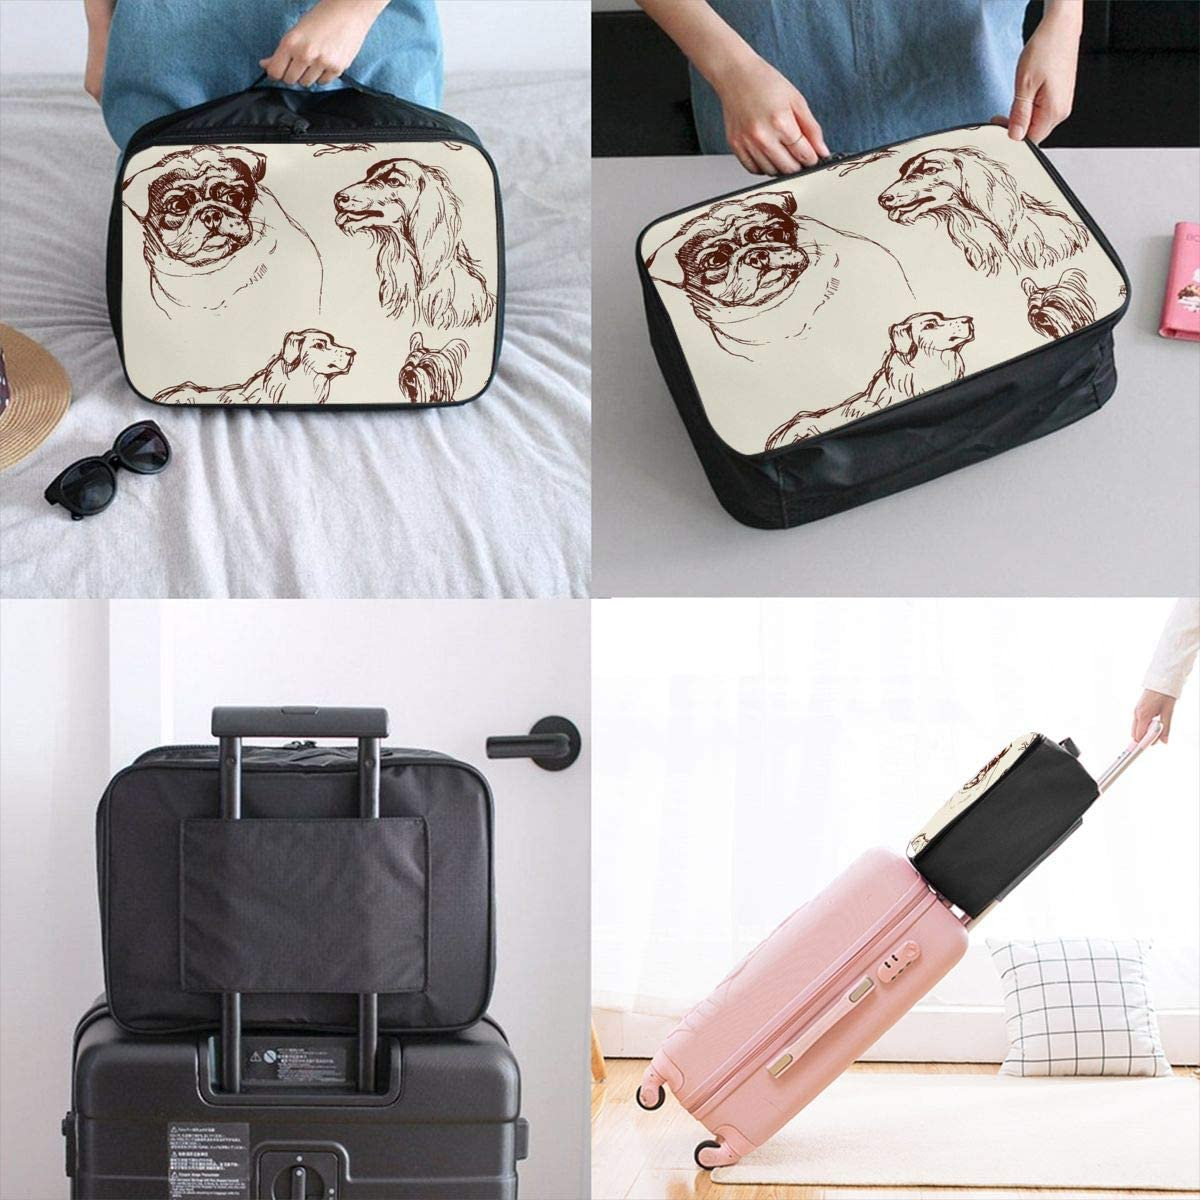 Yunshm Set Of Dogs Labrador Retriever Hound Pug Setter Personalized Trolley Handbag Waterproof Unisex Large Capacity For Business Travel Storage